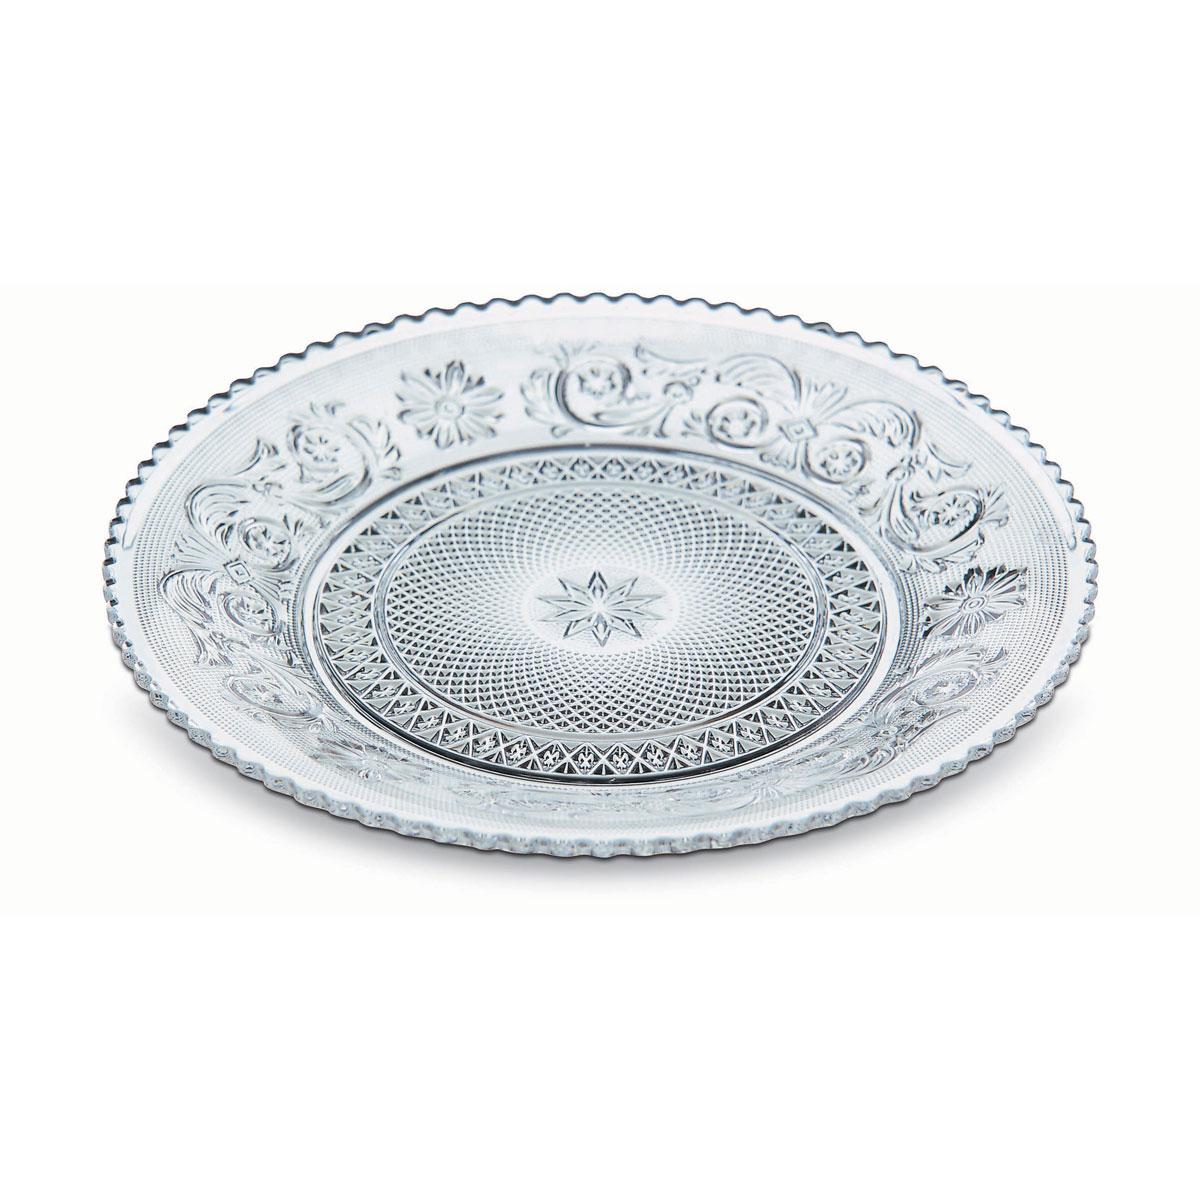 Baccarat Crystal, Arabesque Dessert Plate, Single